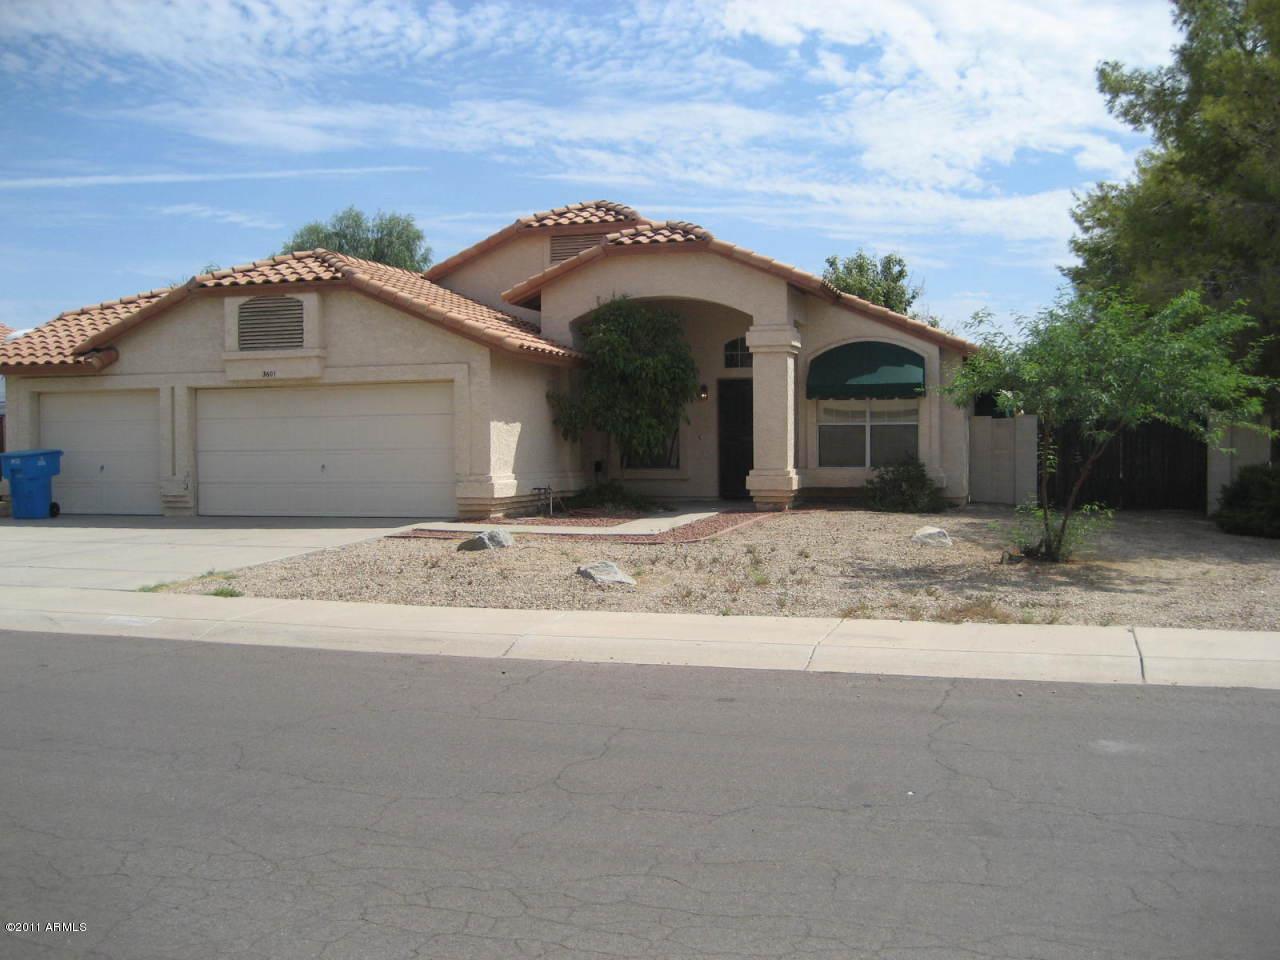 Photo for 3601 E Taro Lane, Phoenix, AZ 85050 (MLS # 5860383)